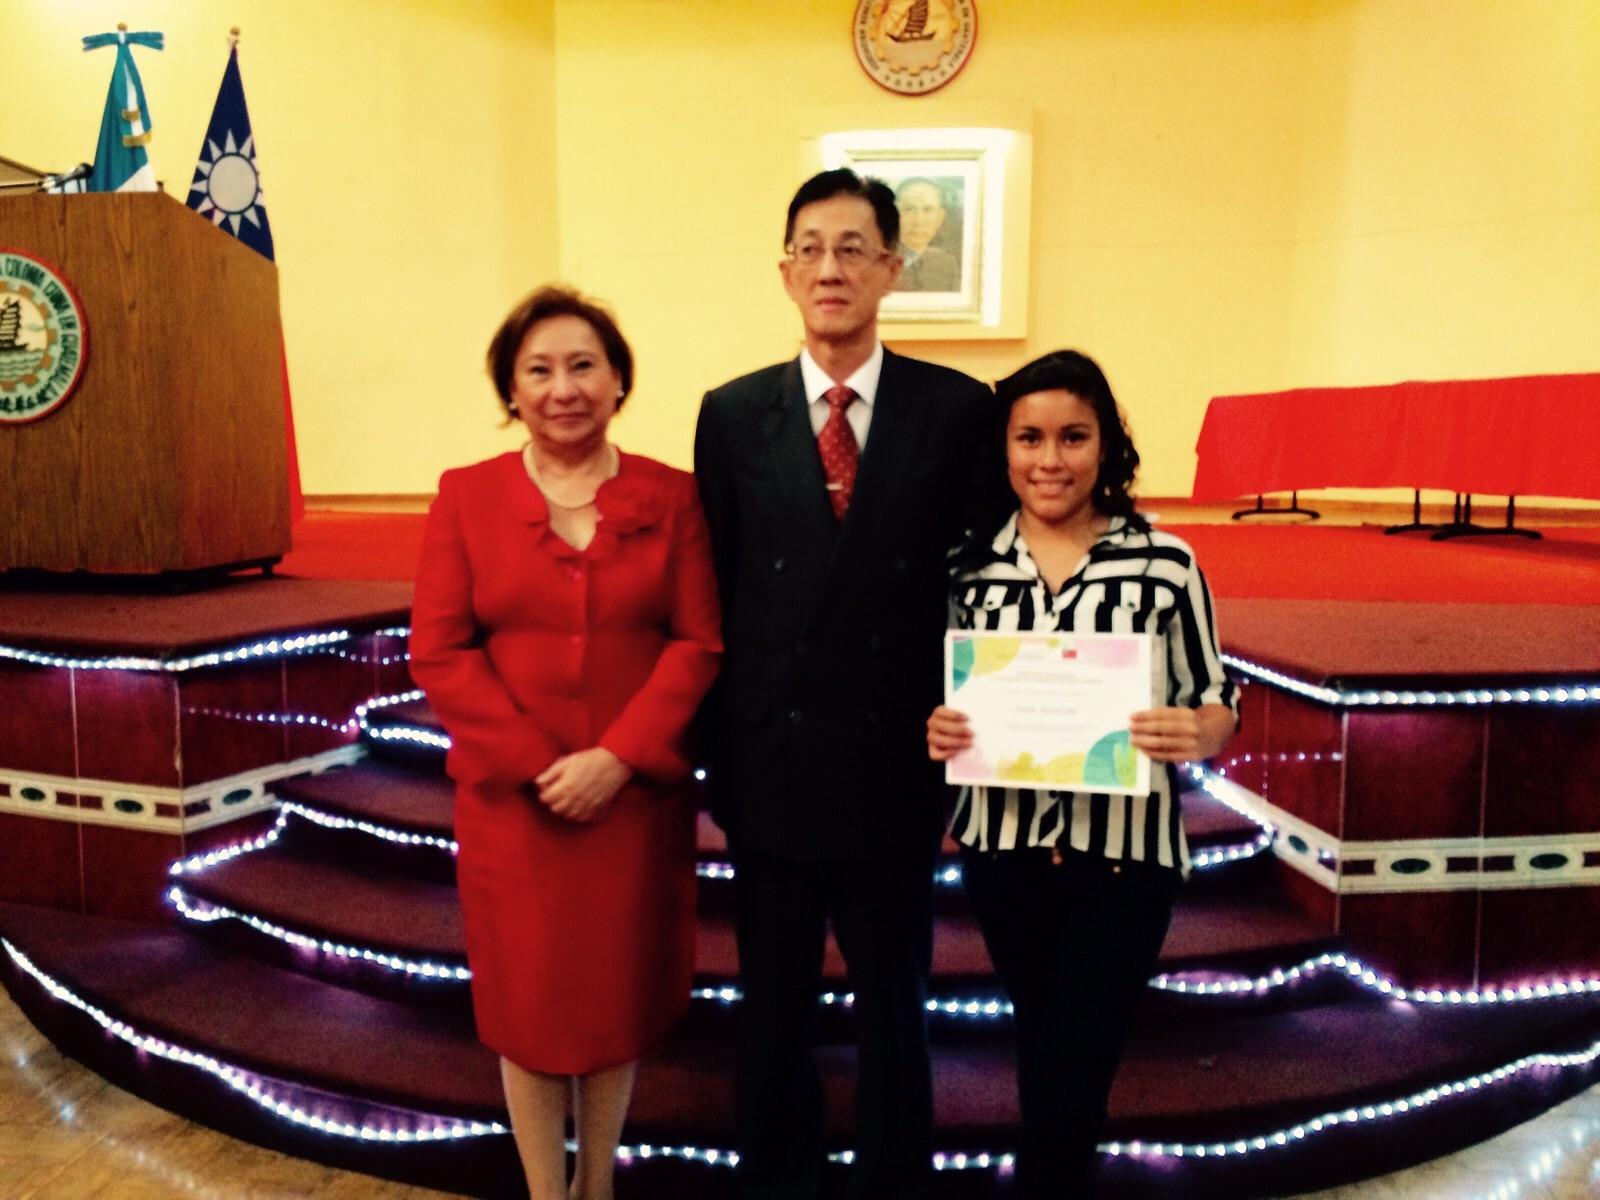 Dora with the Chinese Ambassador